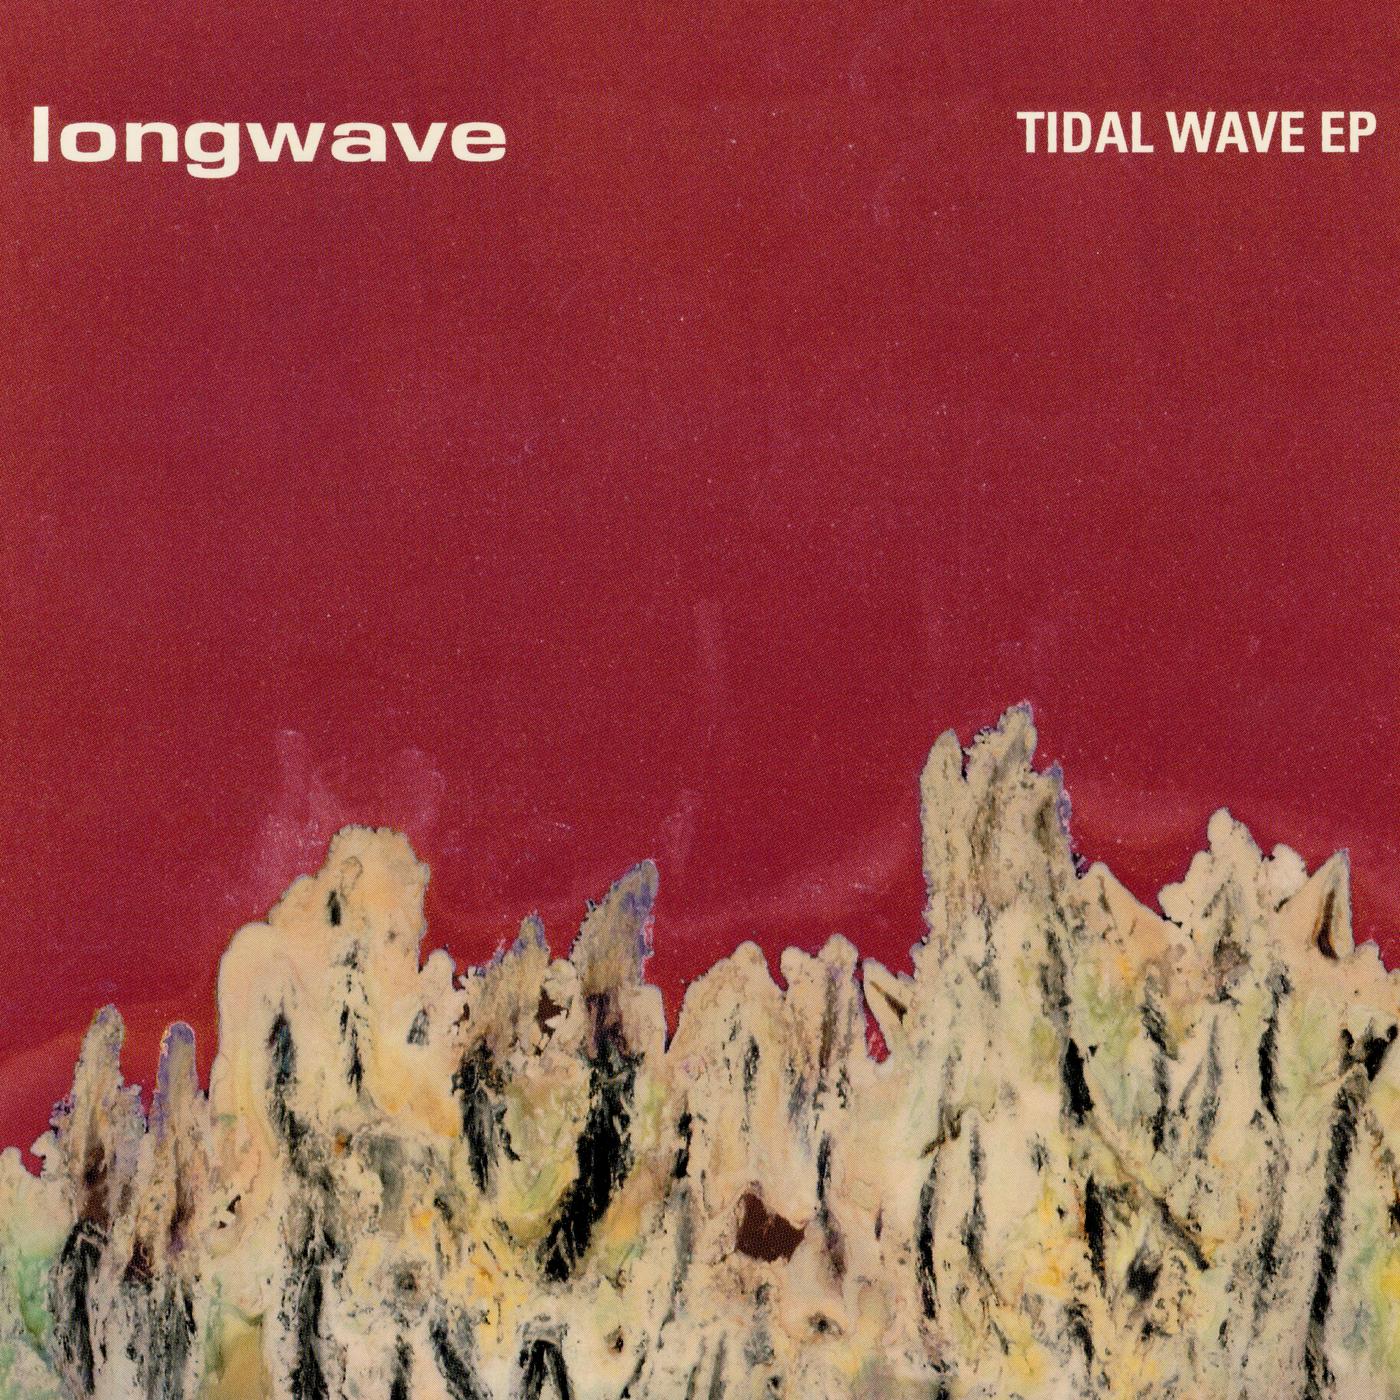 Tidal Wave EP - Longwave